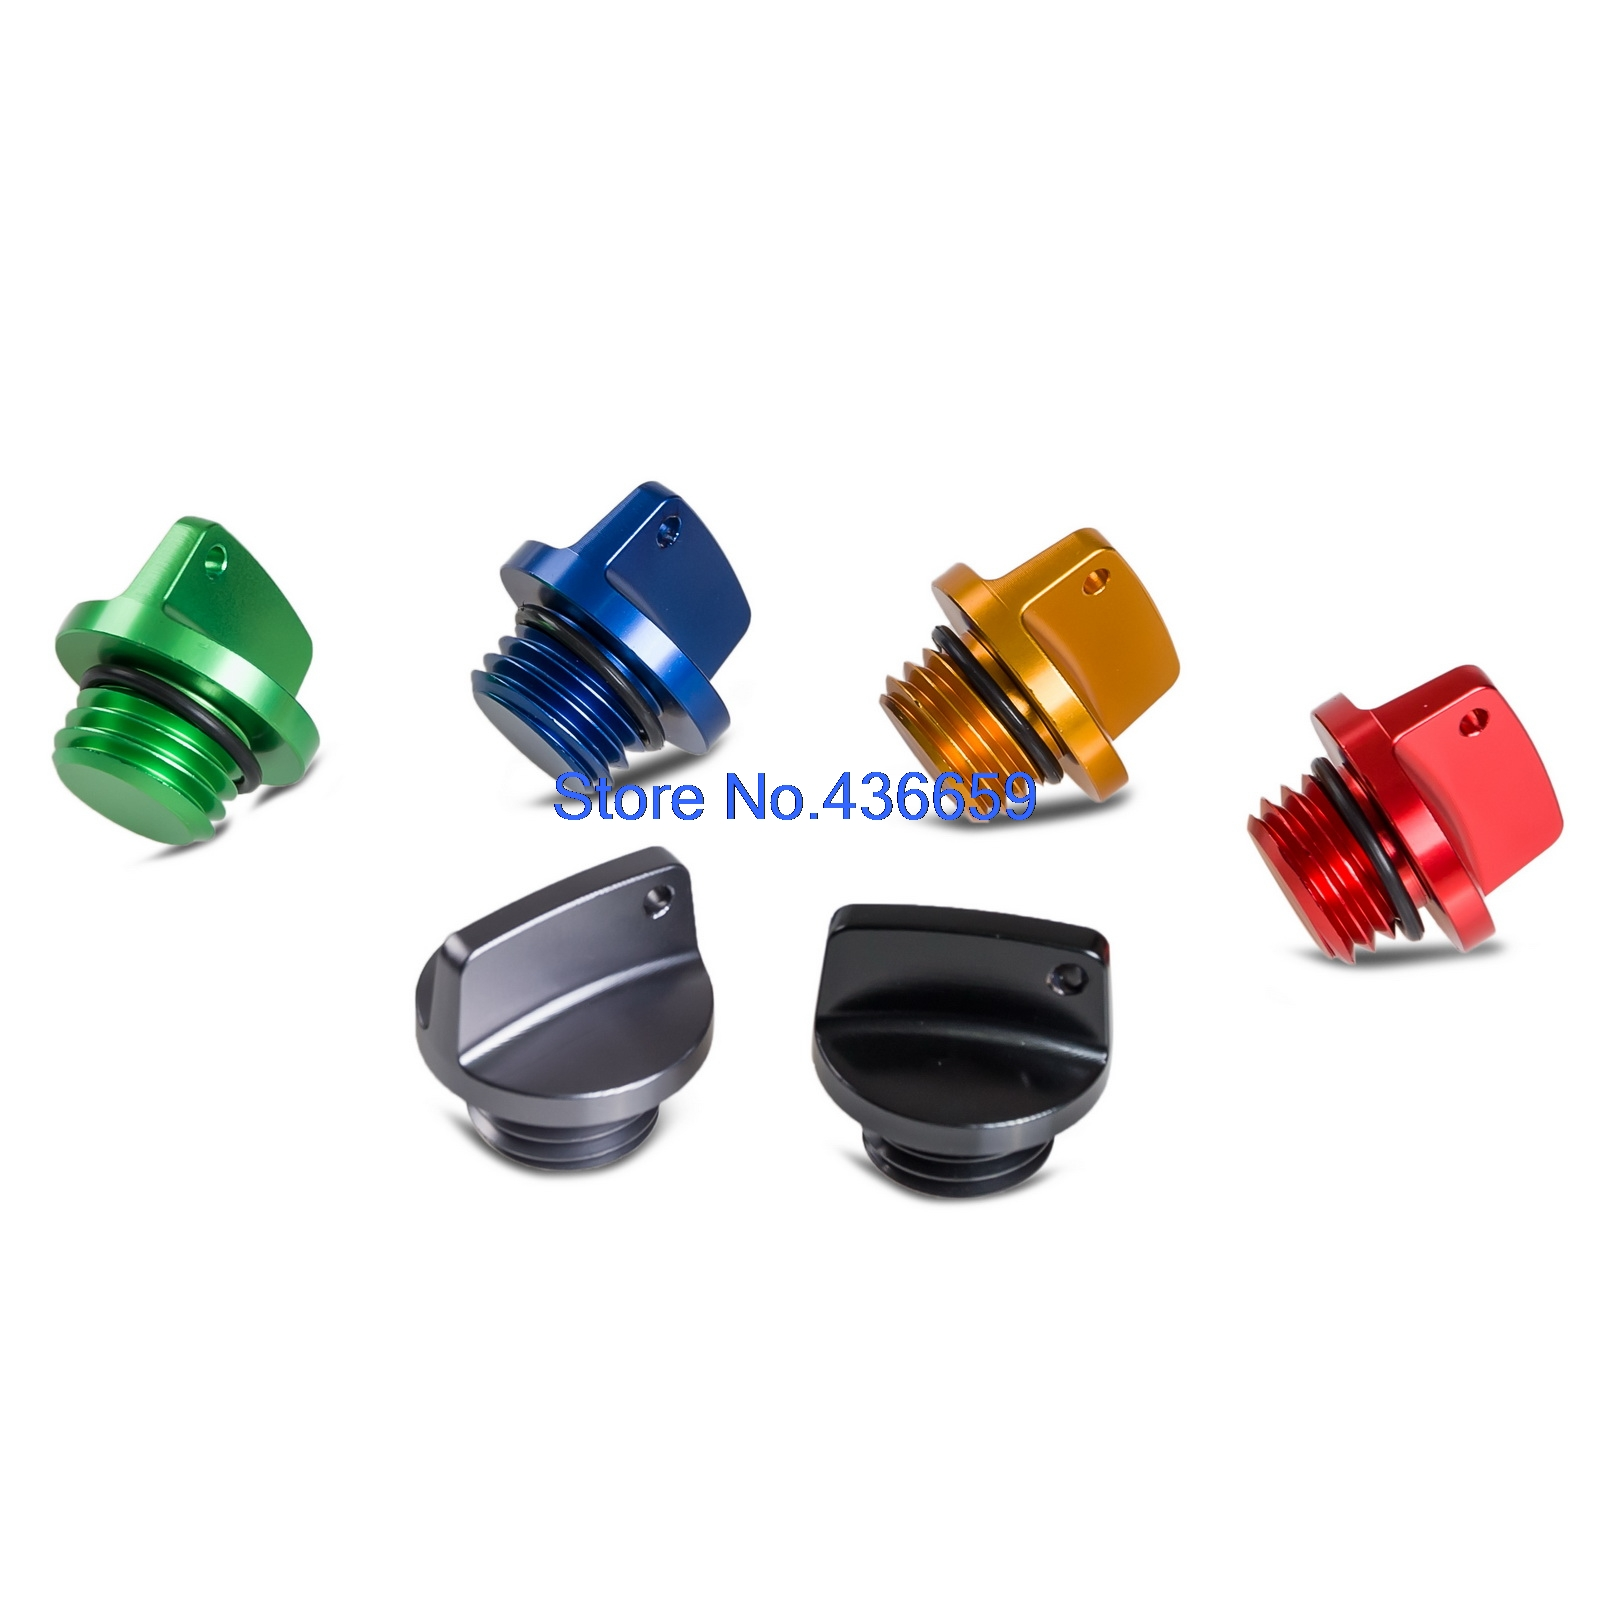 Čep za čep za ulje CNC-a za Honda CB250F CB300F CB400X CB400F CB400SF CB500X CB500F CB1100 VTR1000F VTR1200F VTR11200X CB250F